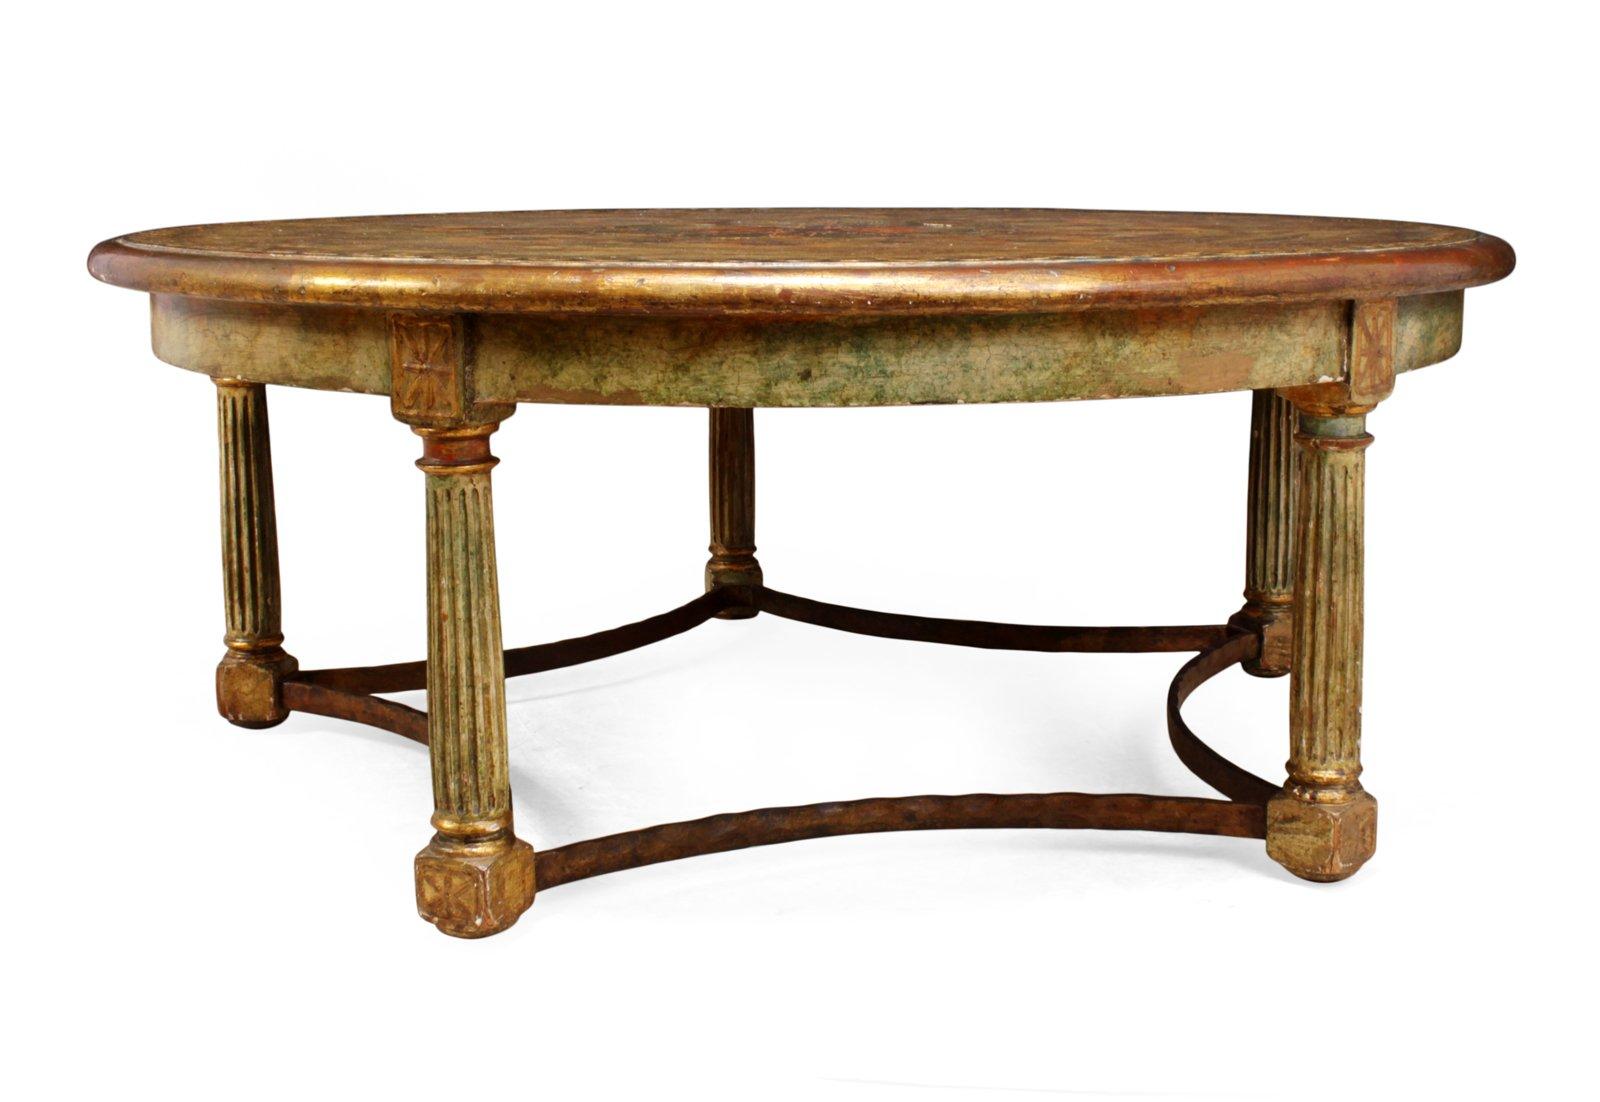 Table basse gesso peinte italie 1880s en vente sur pamono - Table basse peinte ...